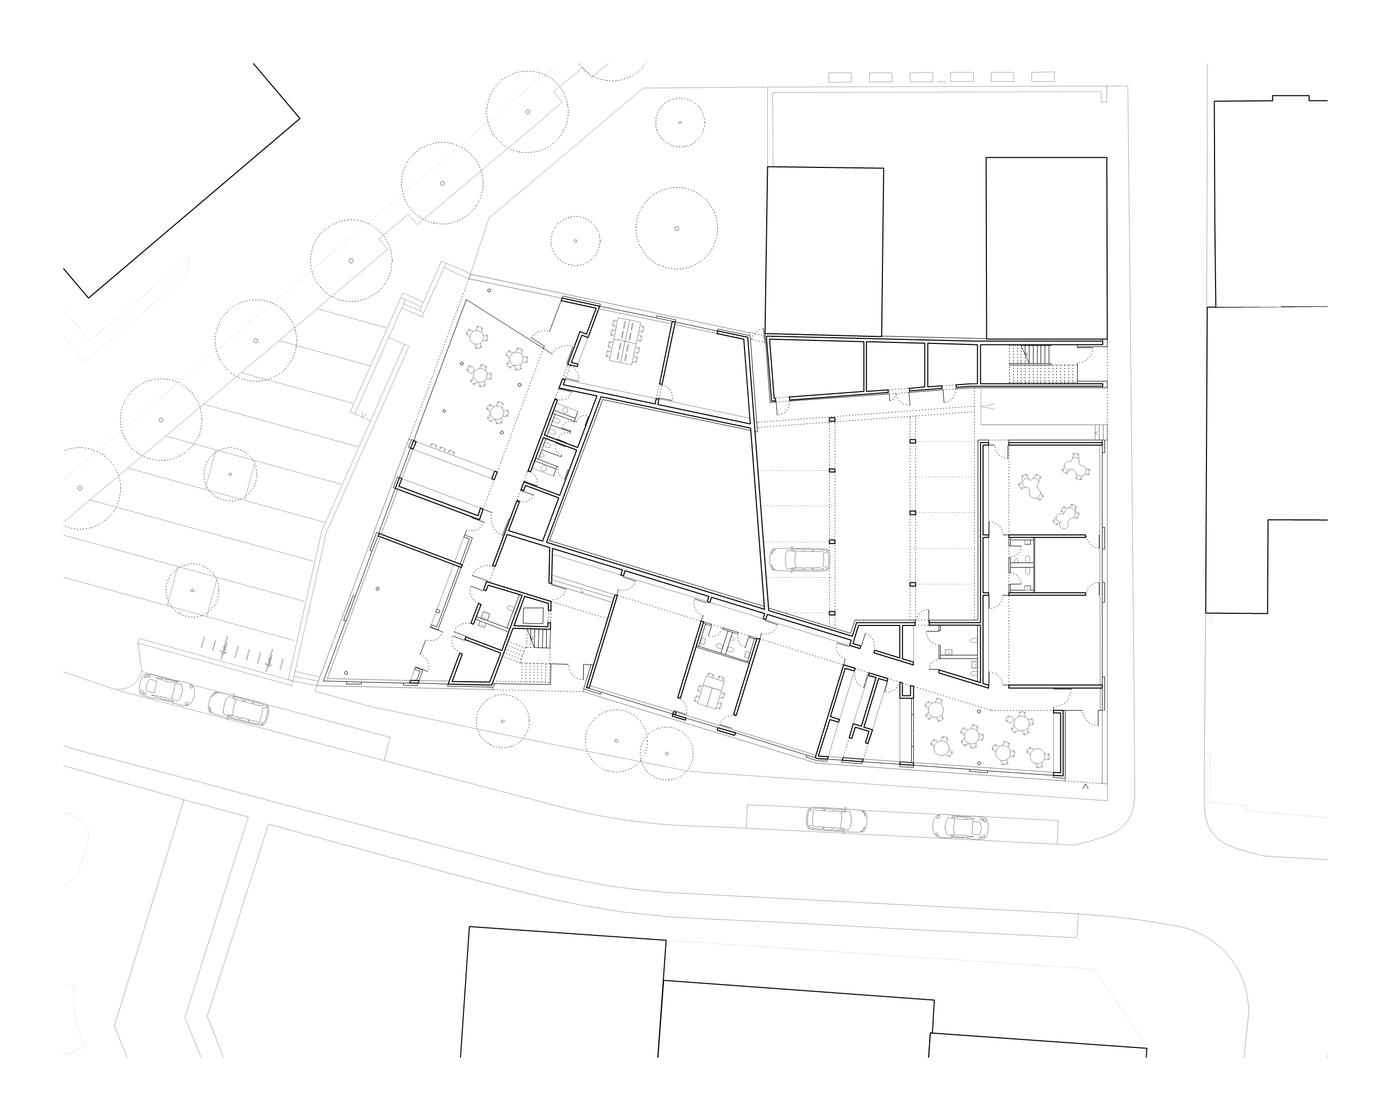 Kinder- und Jugendzentrum Pankratiusstraße Darmstadt Grundriss Erdgeschoss